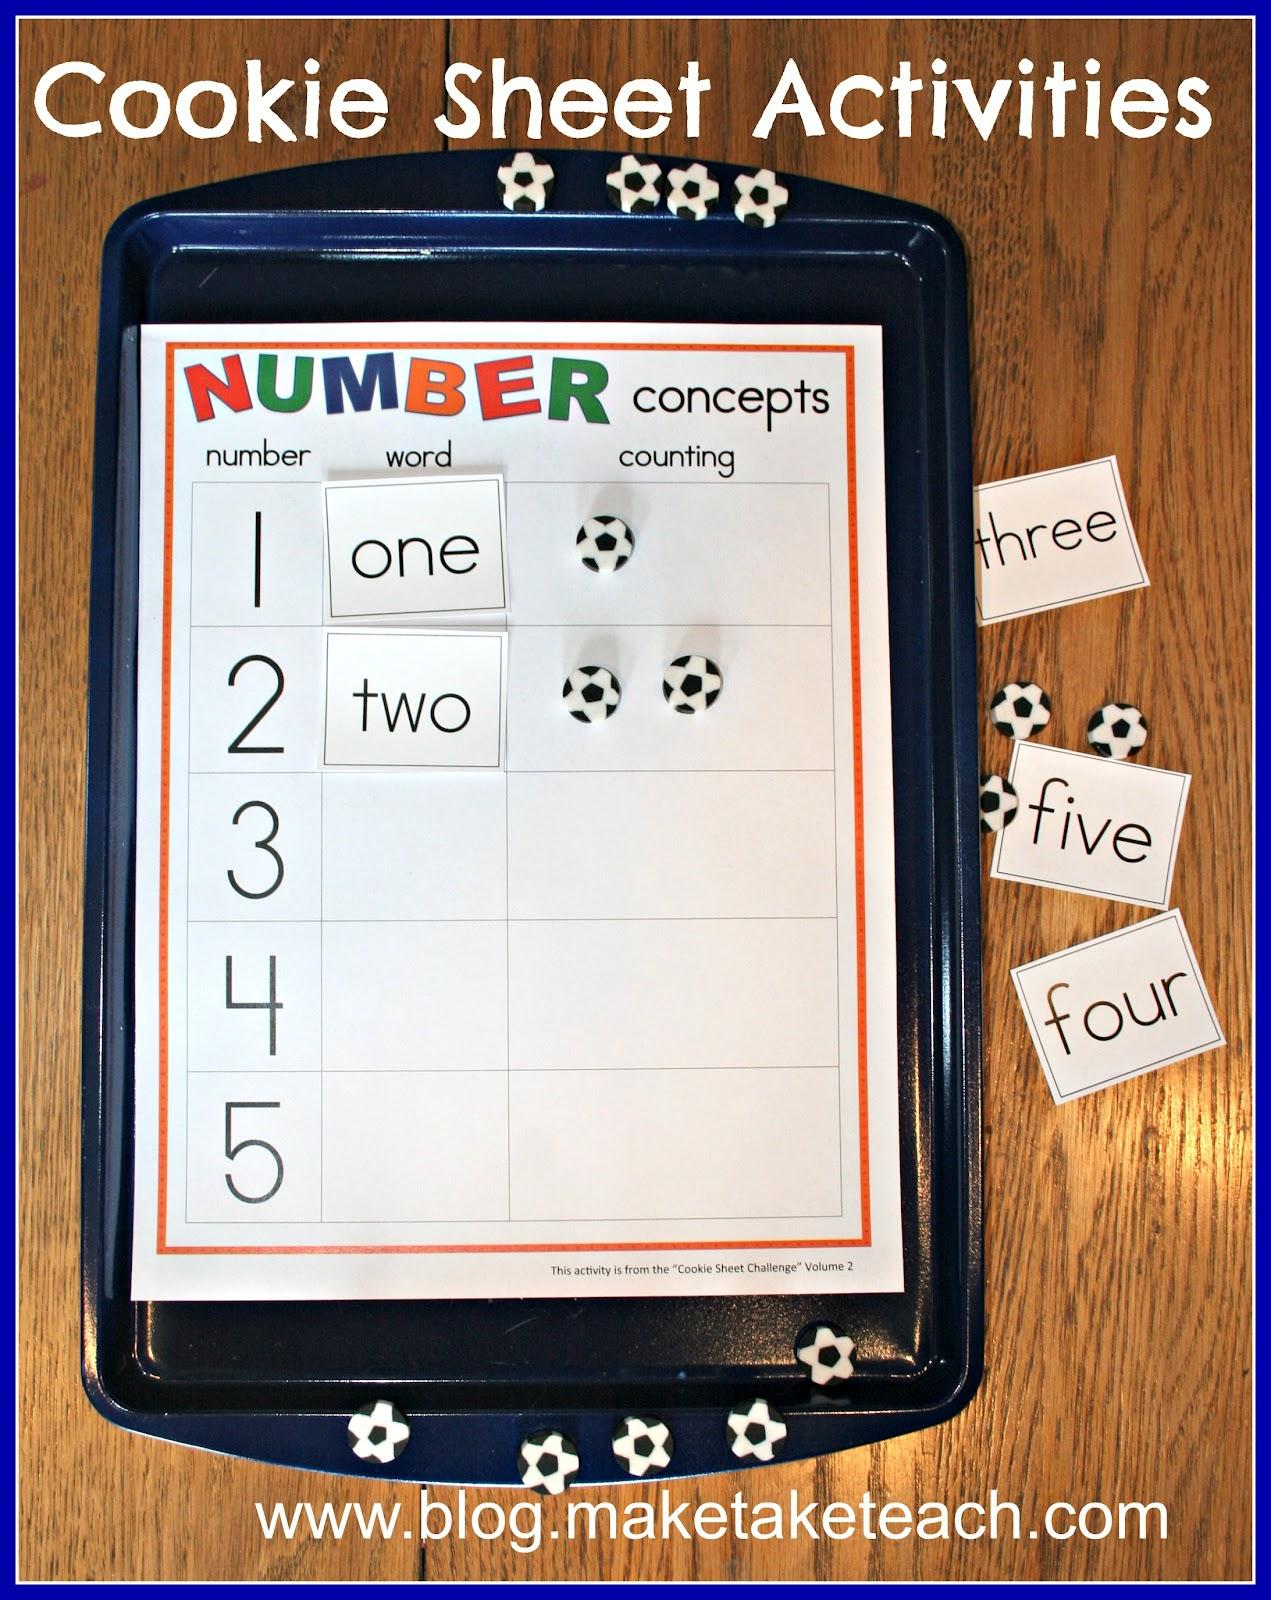 Cookie Sheet Activities Math Concepts